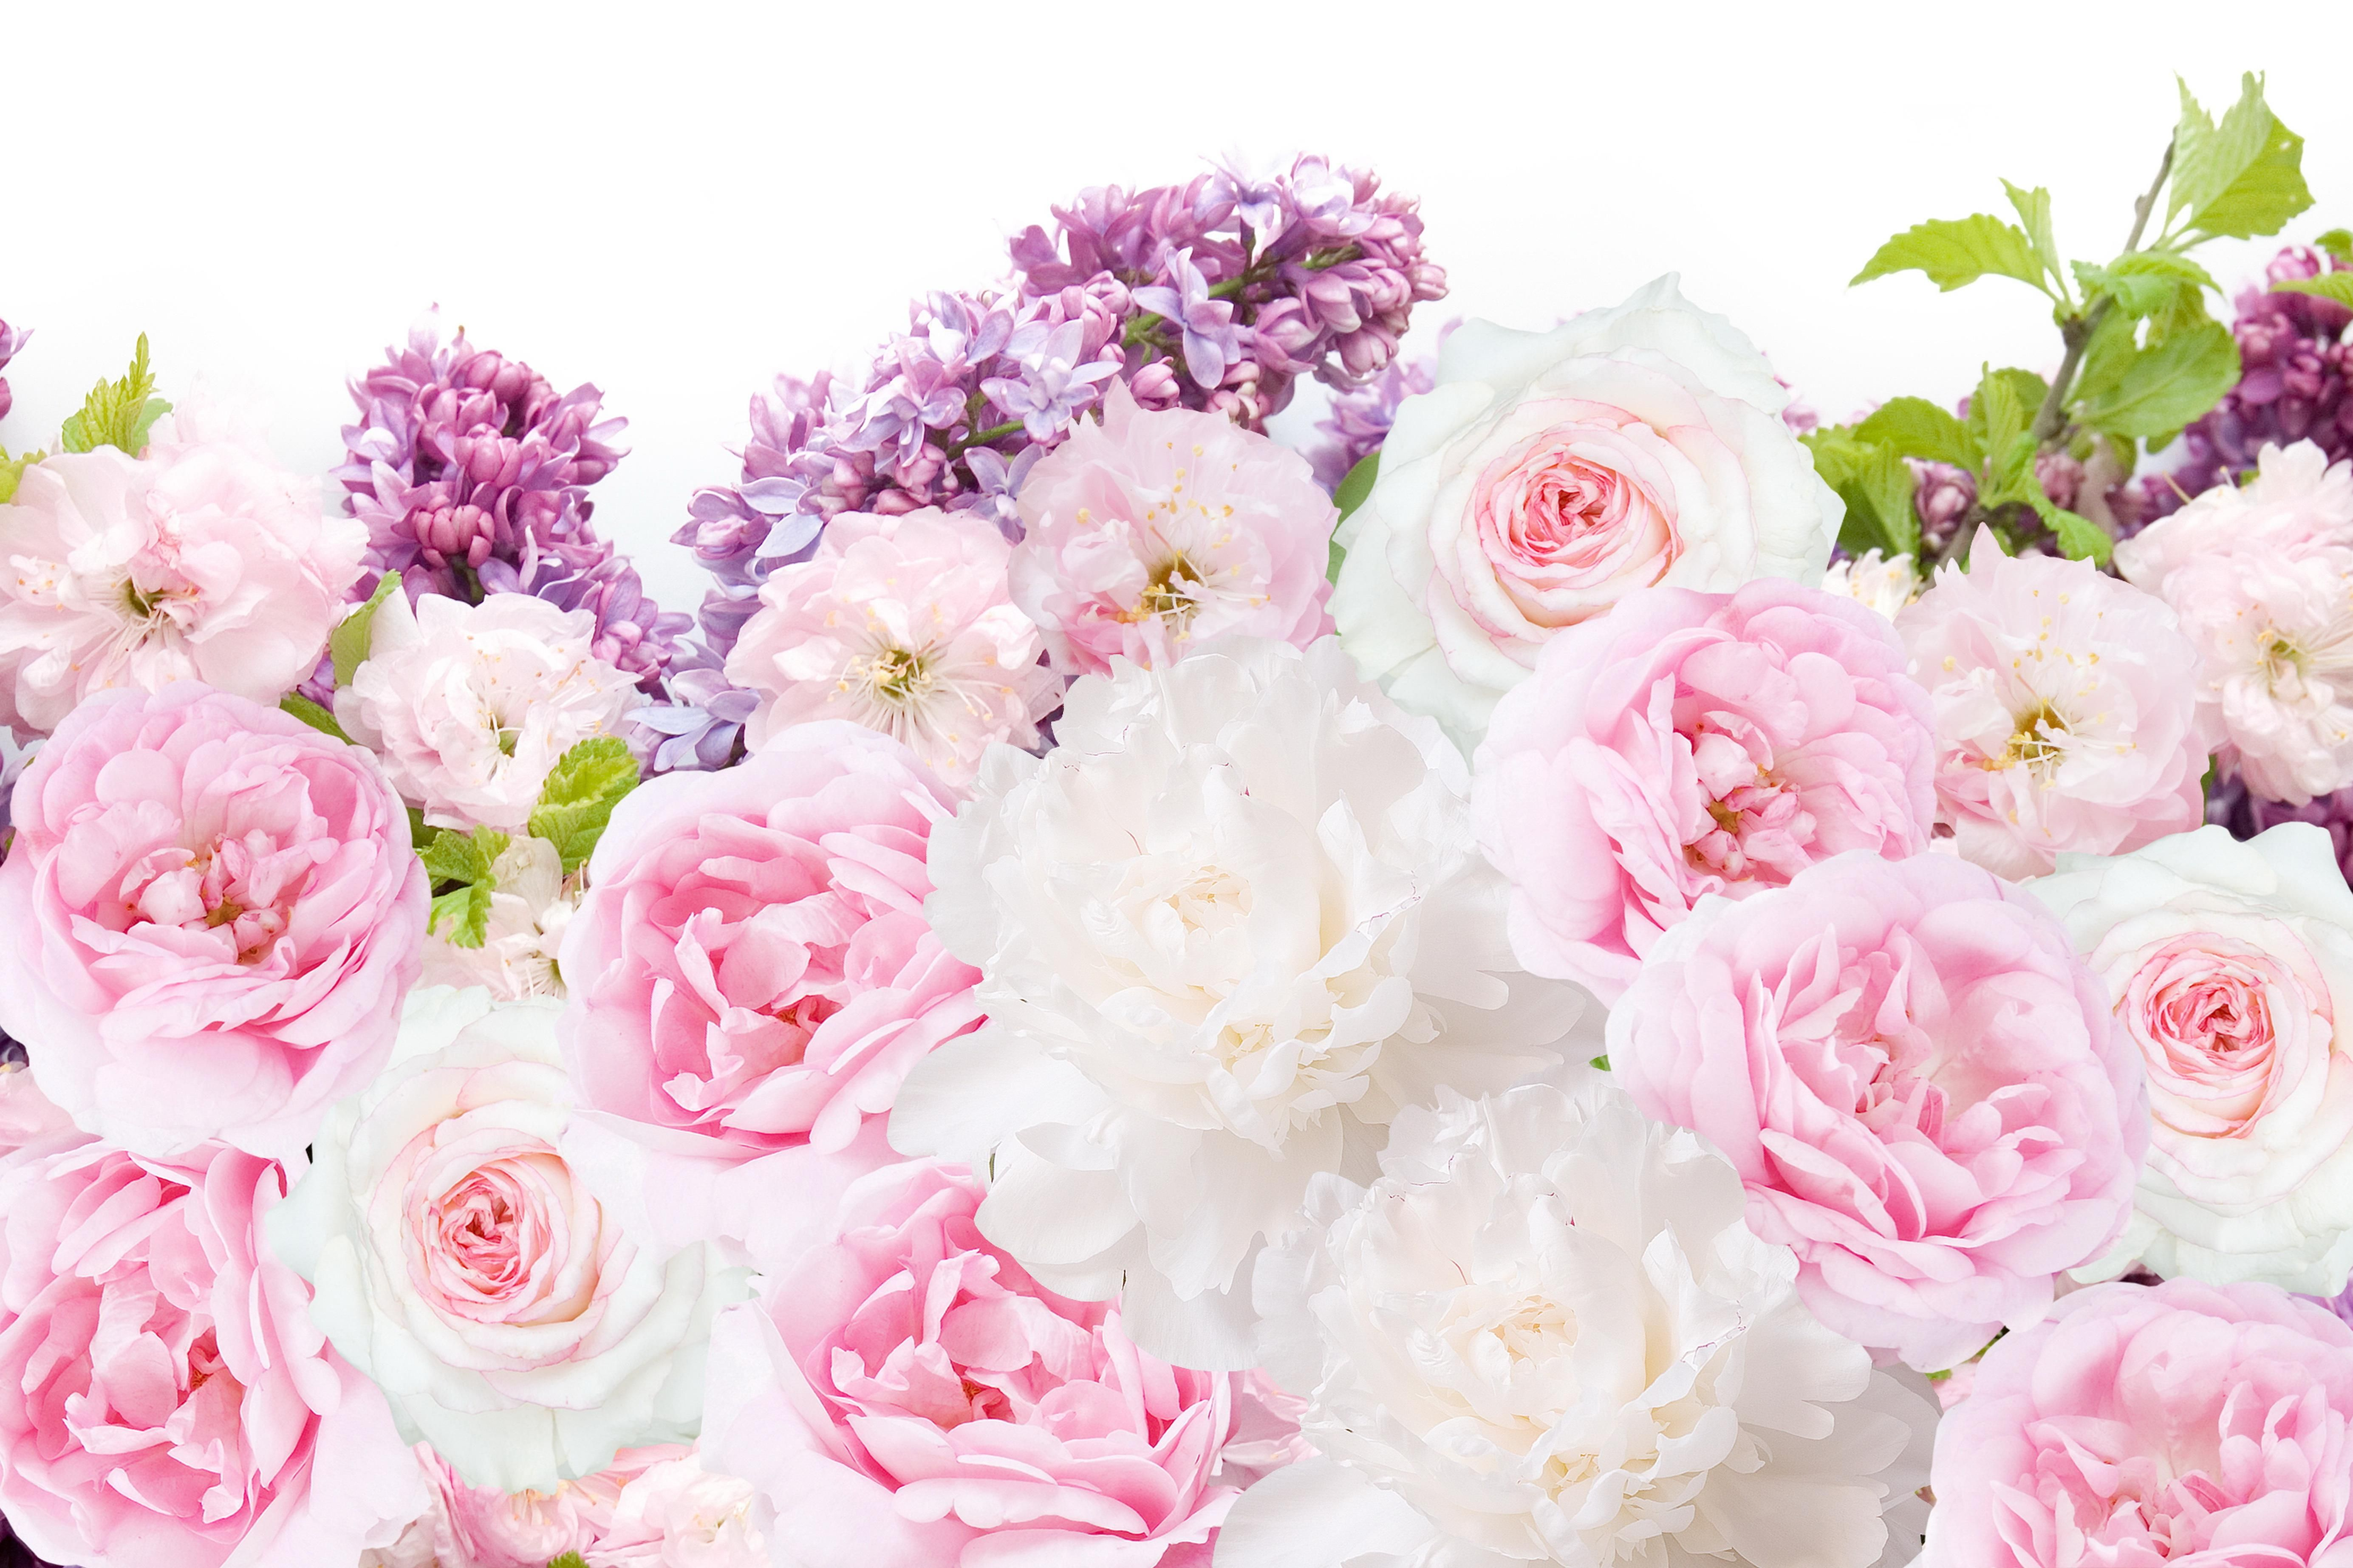 Pink white peonies floral desktop wallpaper background